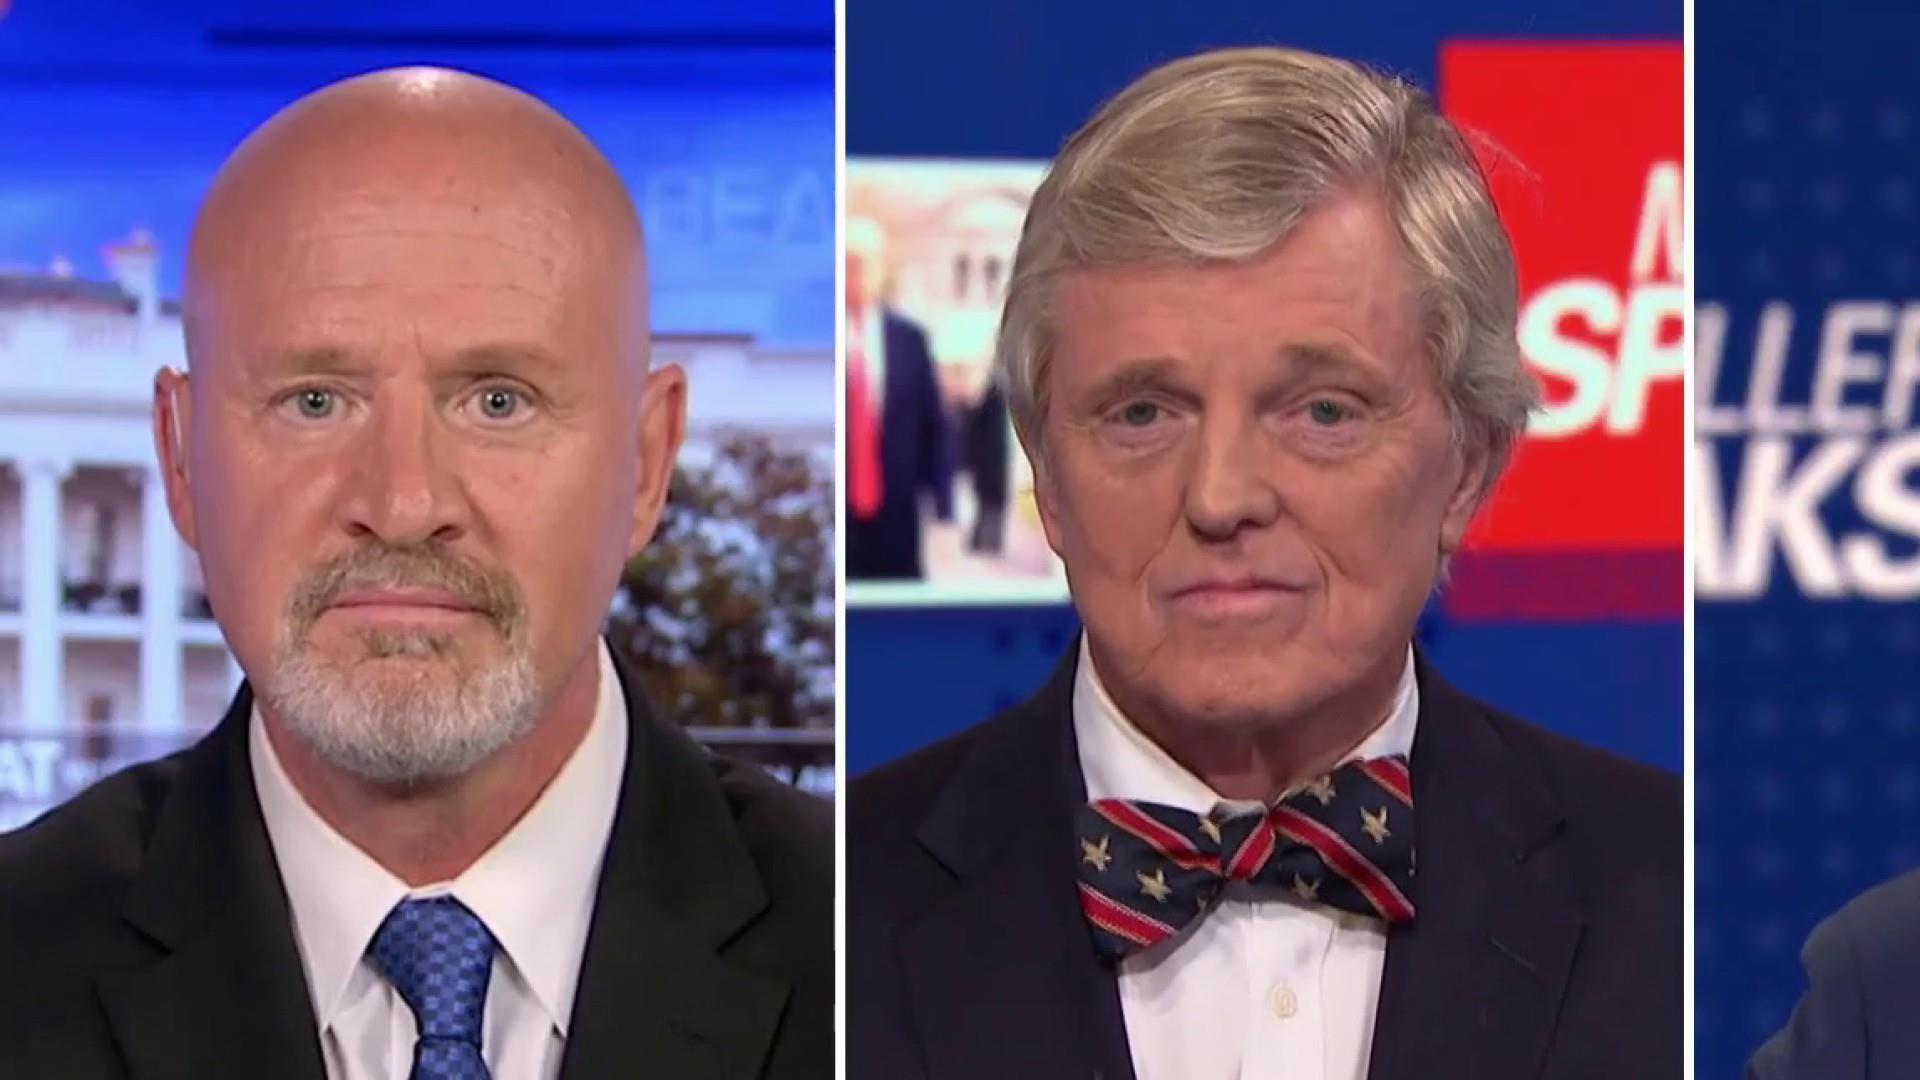 Prosecutors debate: did Bob Mueller let Pres. Trump off the hook?